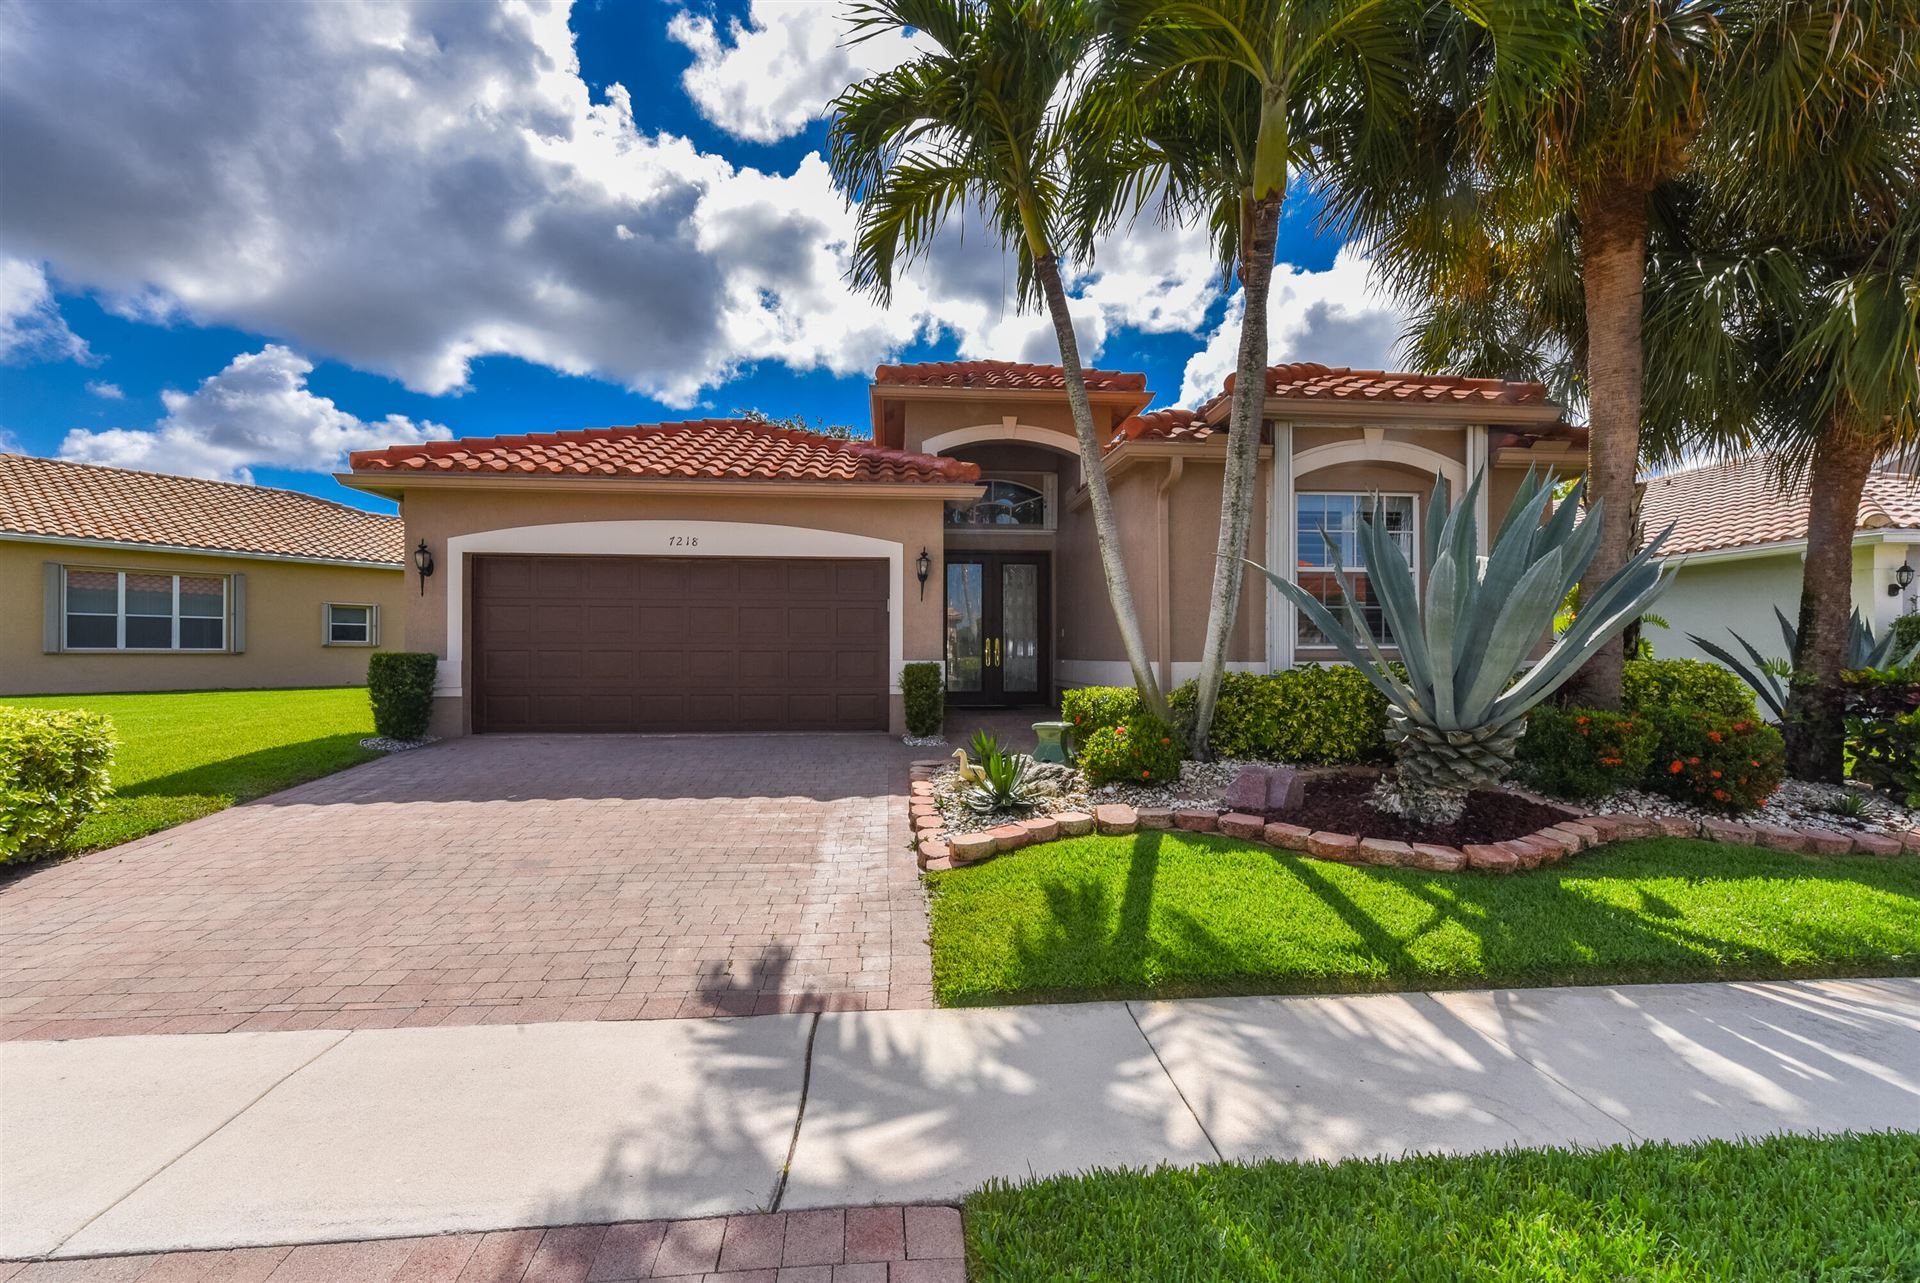 7218 Catania Drive, Boynton Beach, FL 33472 - MLS#: RX-10713814